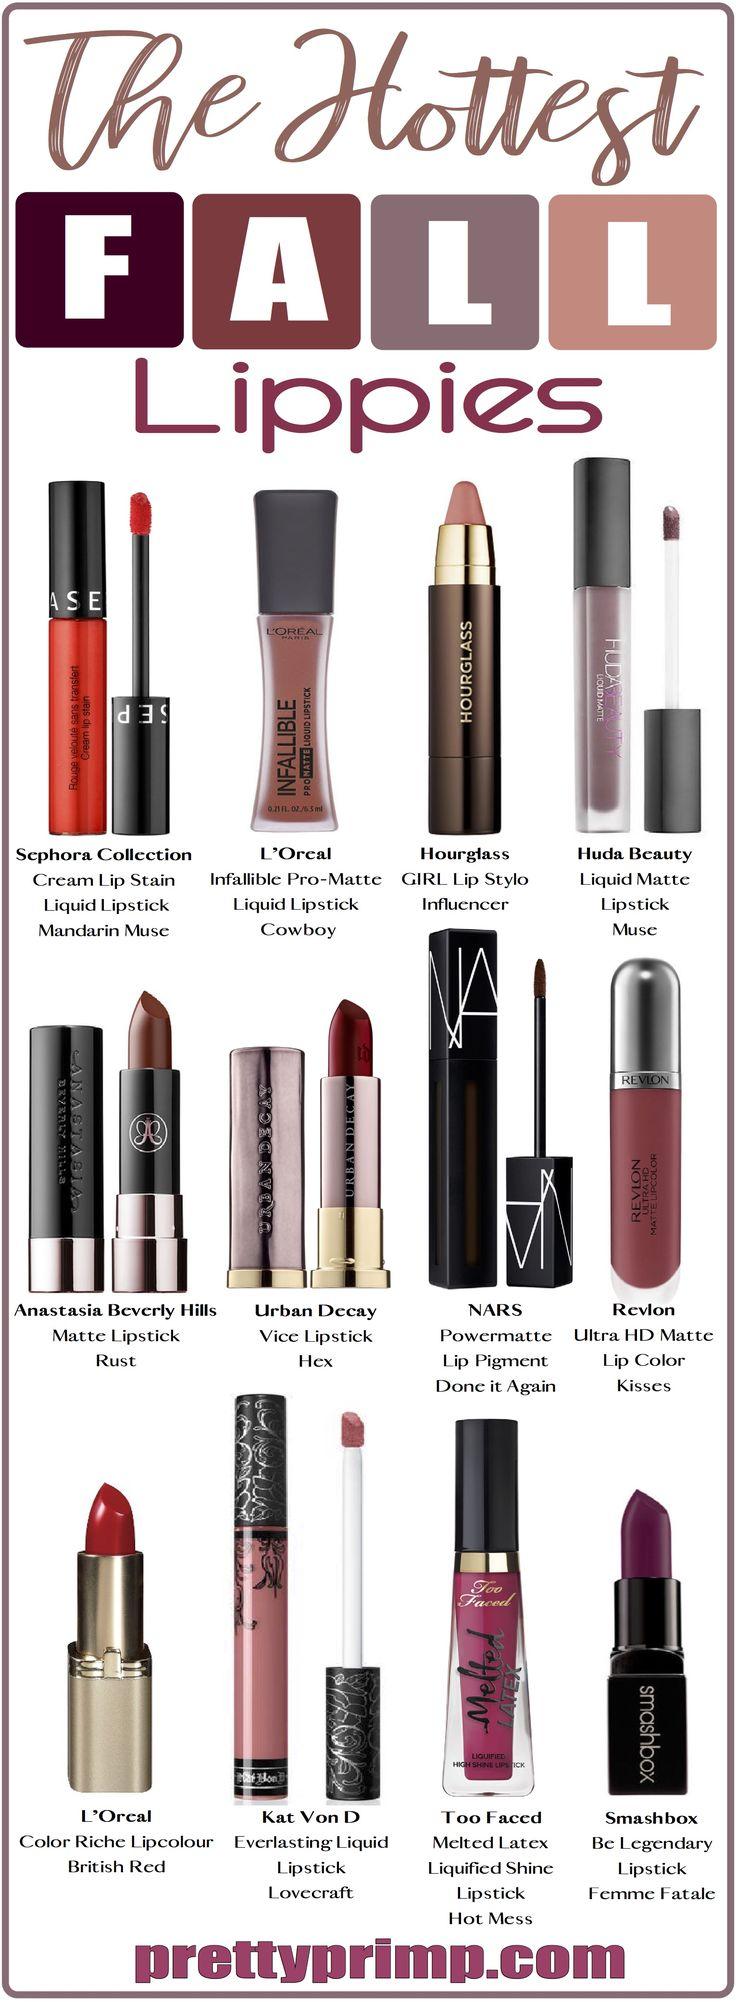 The most on trend lipsticks, liquid lipsticks, matte lipsticks, and more for fall!